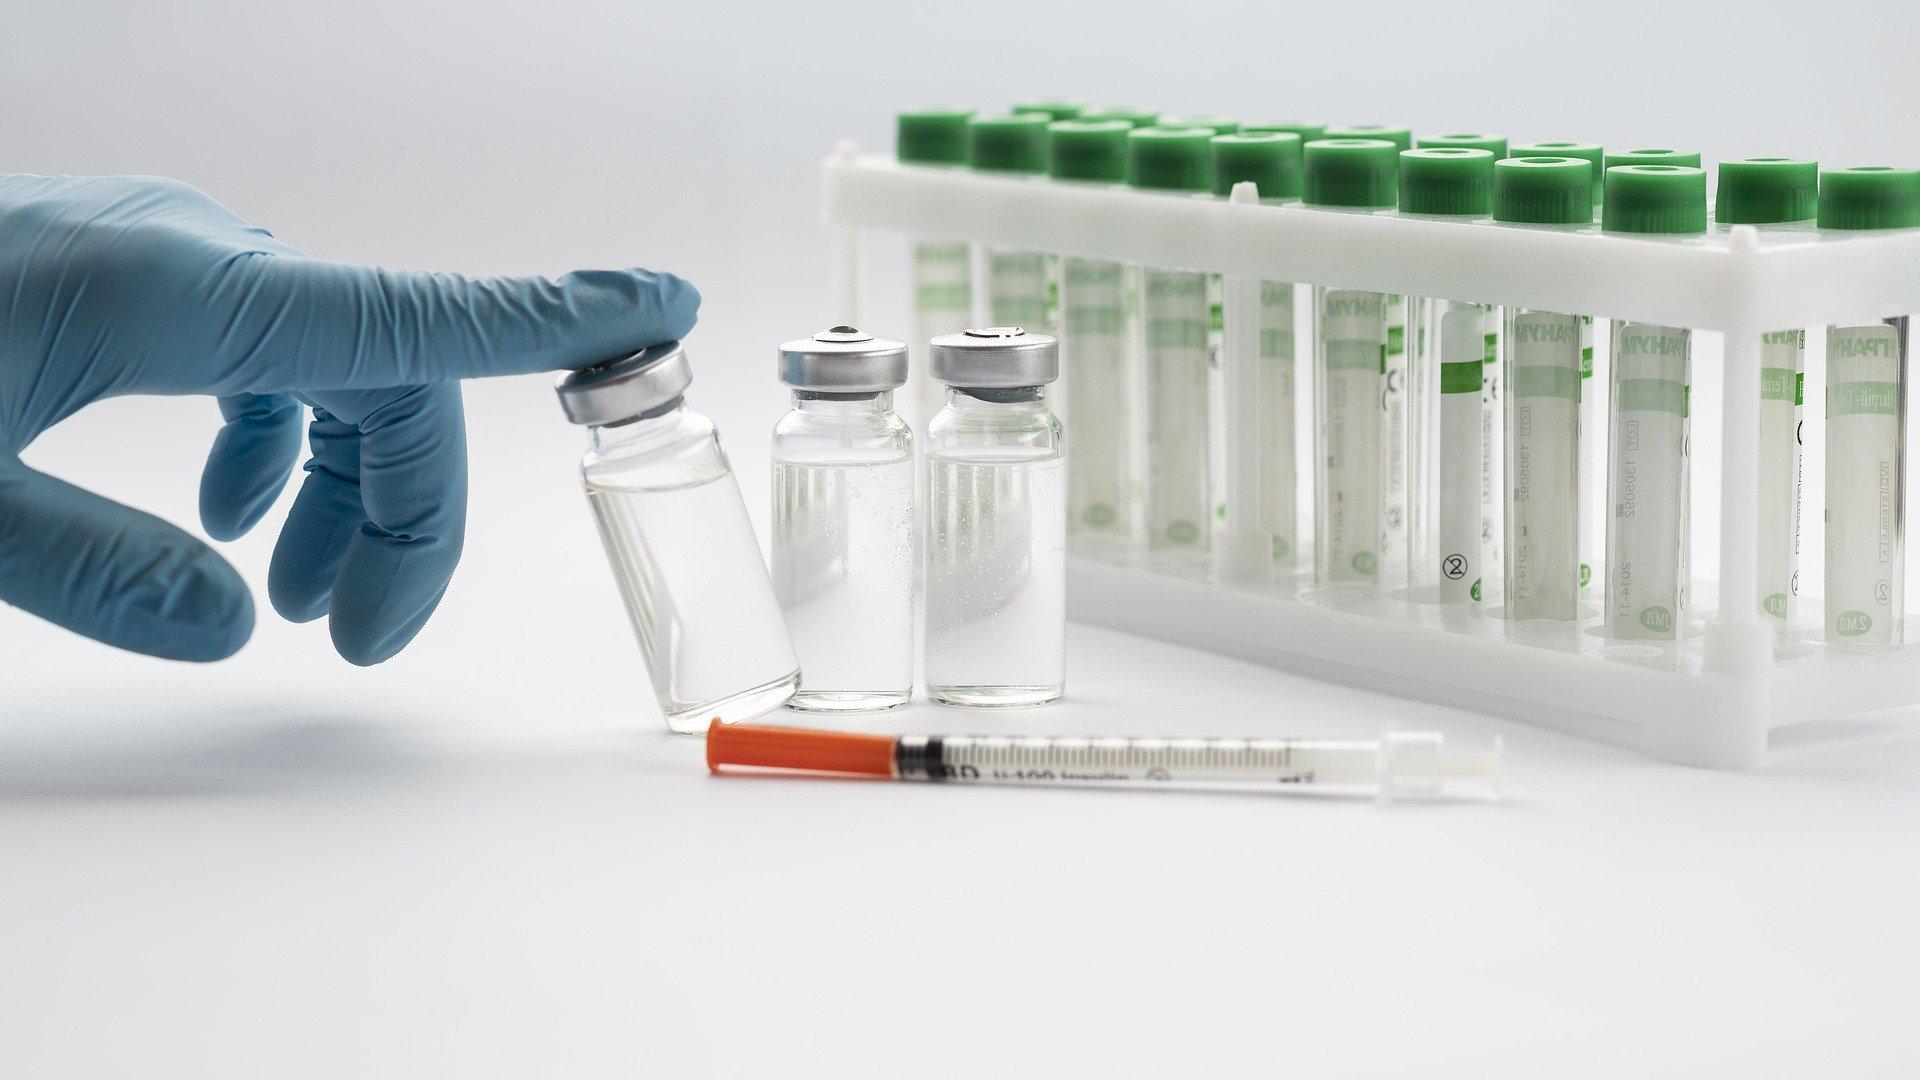 Bharat Biotech's Covid-19 vaccine shows 100% efficacy